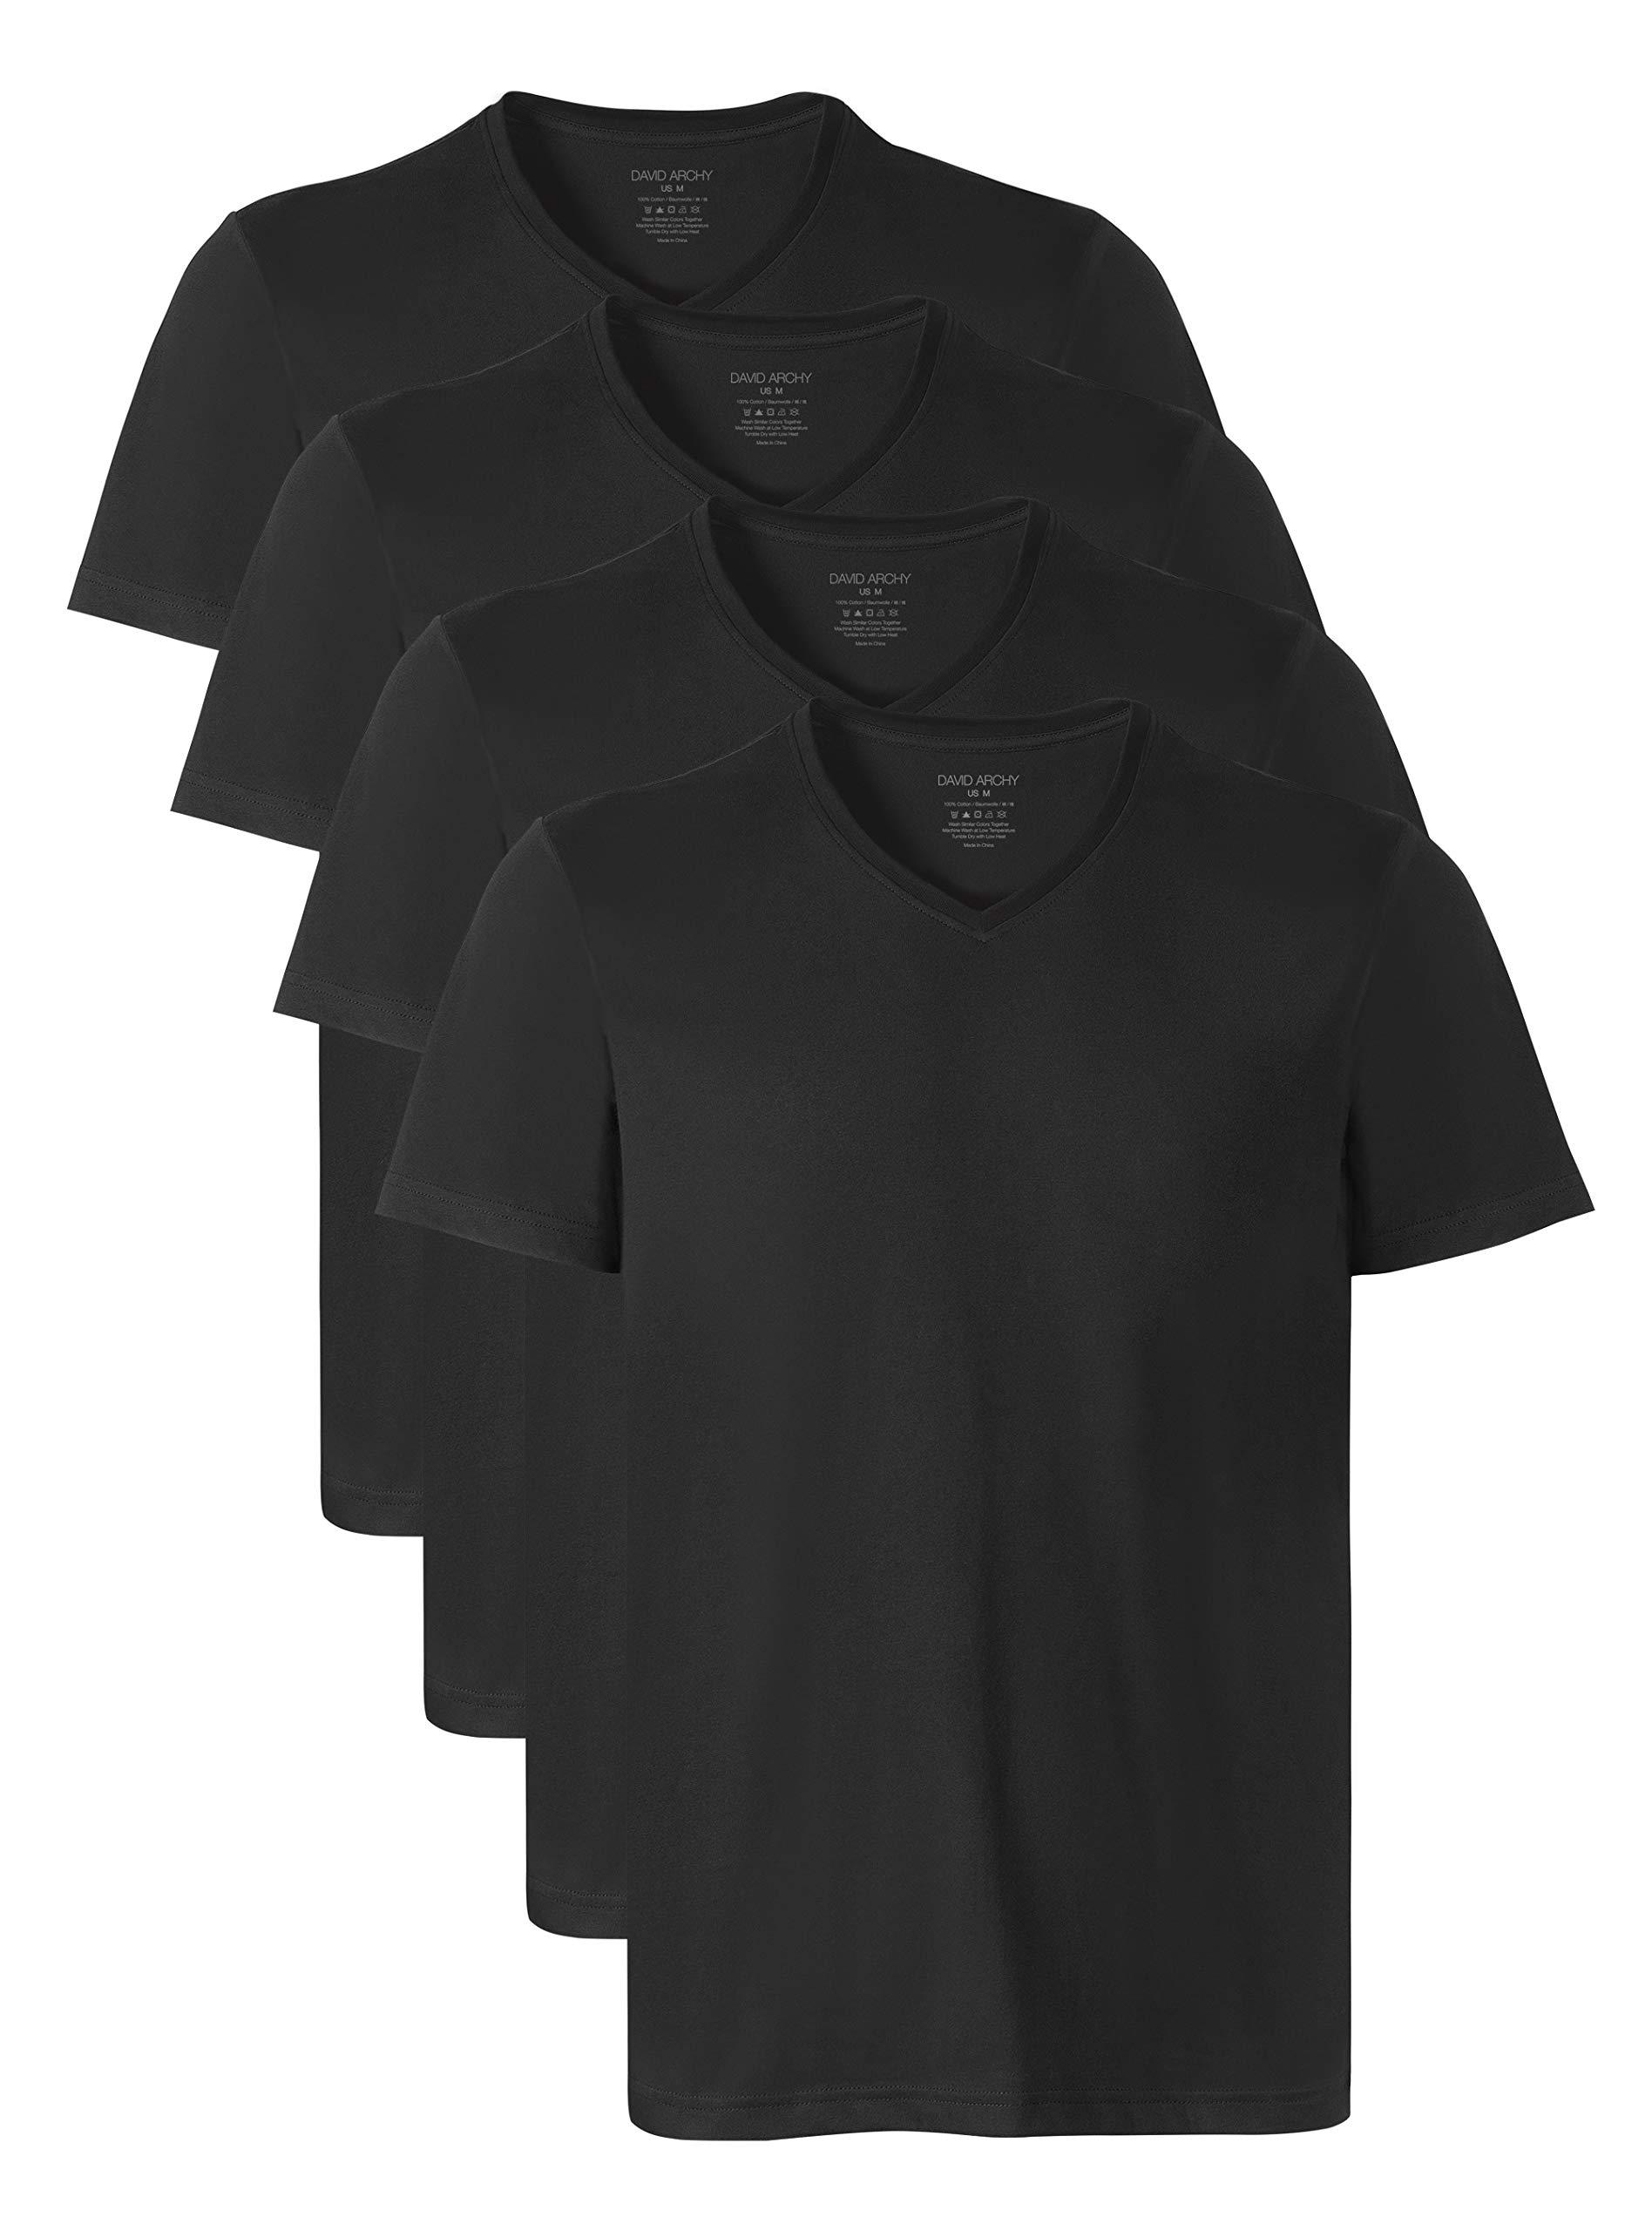 David Archy Men's Short Sleeve V-Neck Premium Cotton Undershirts T-Shirts in 4 Pack (S, Black) by David Archy